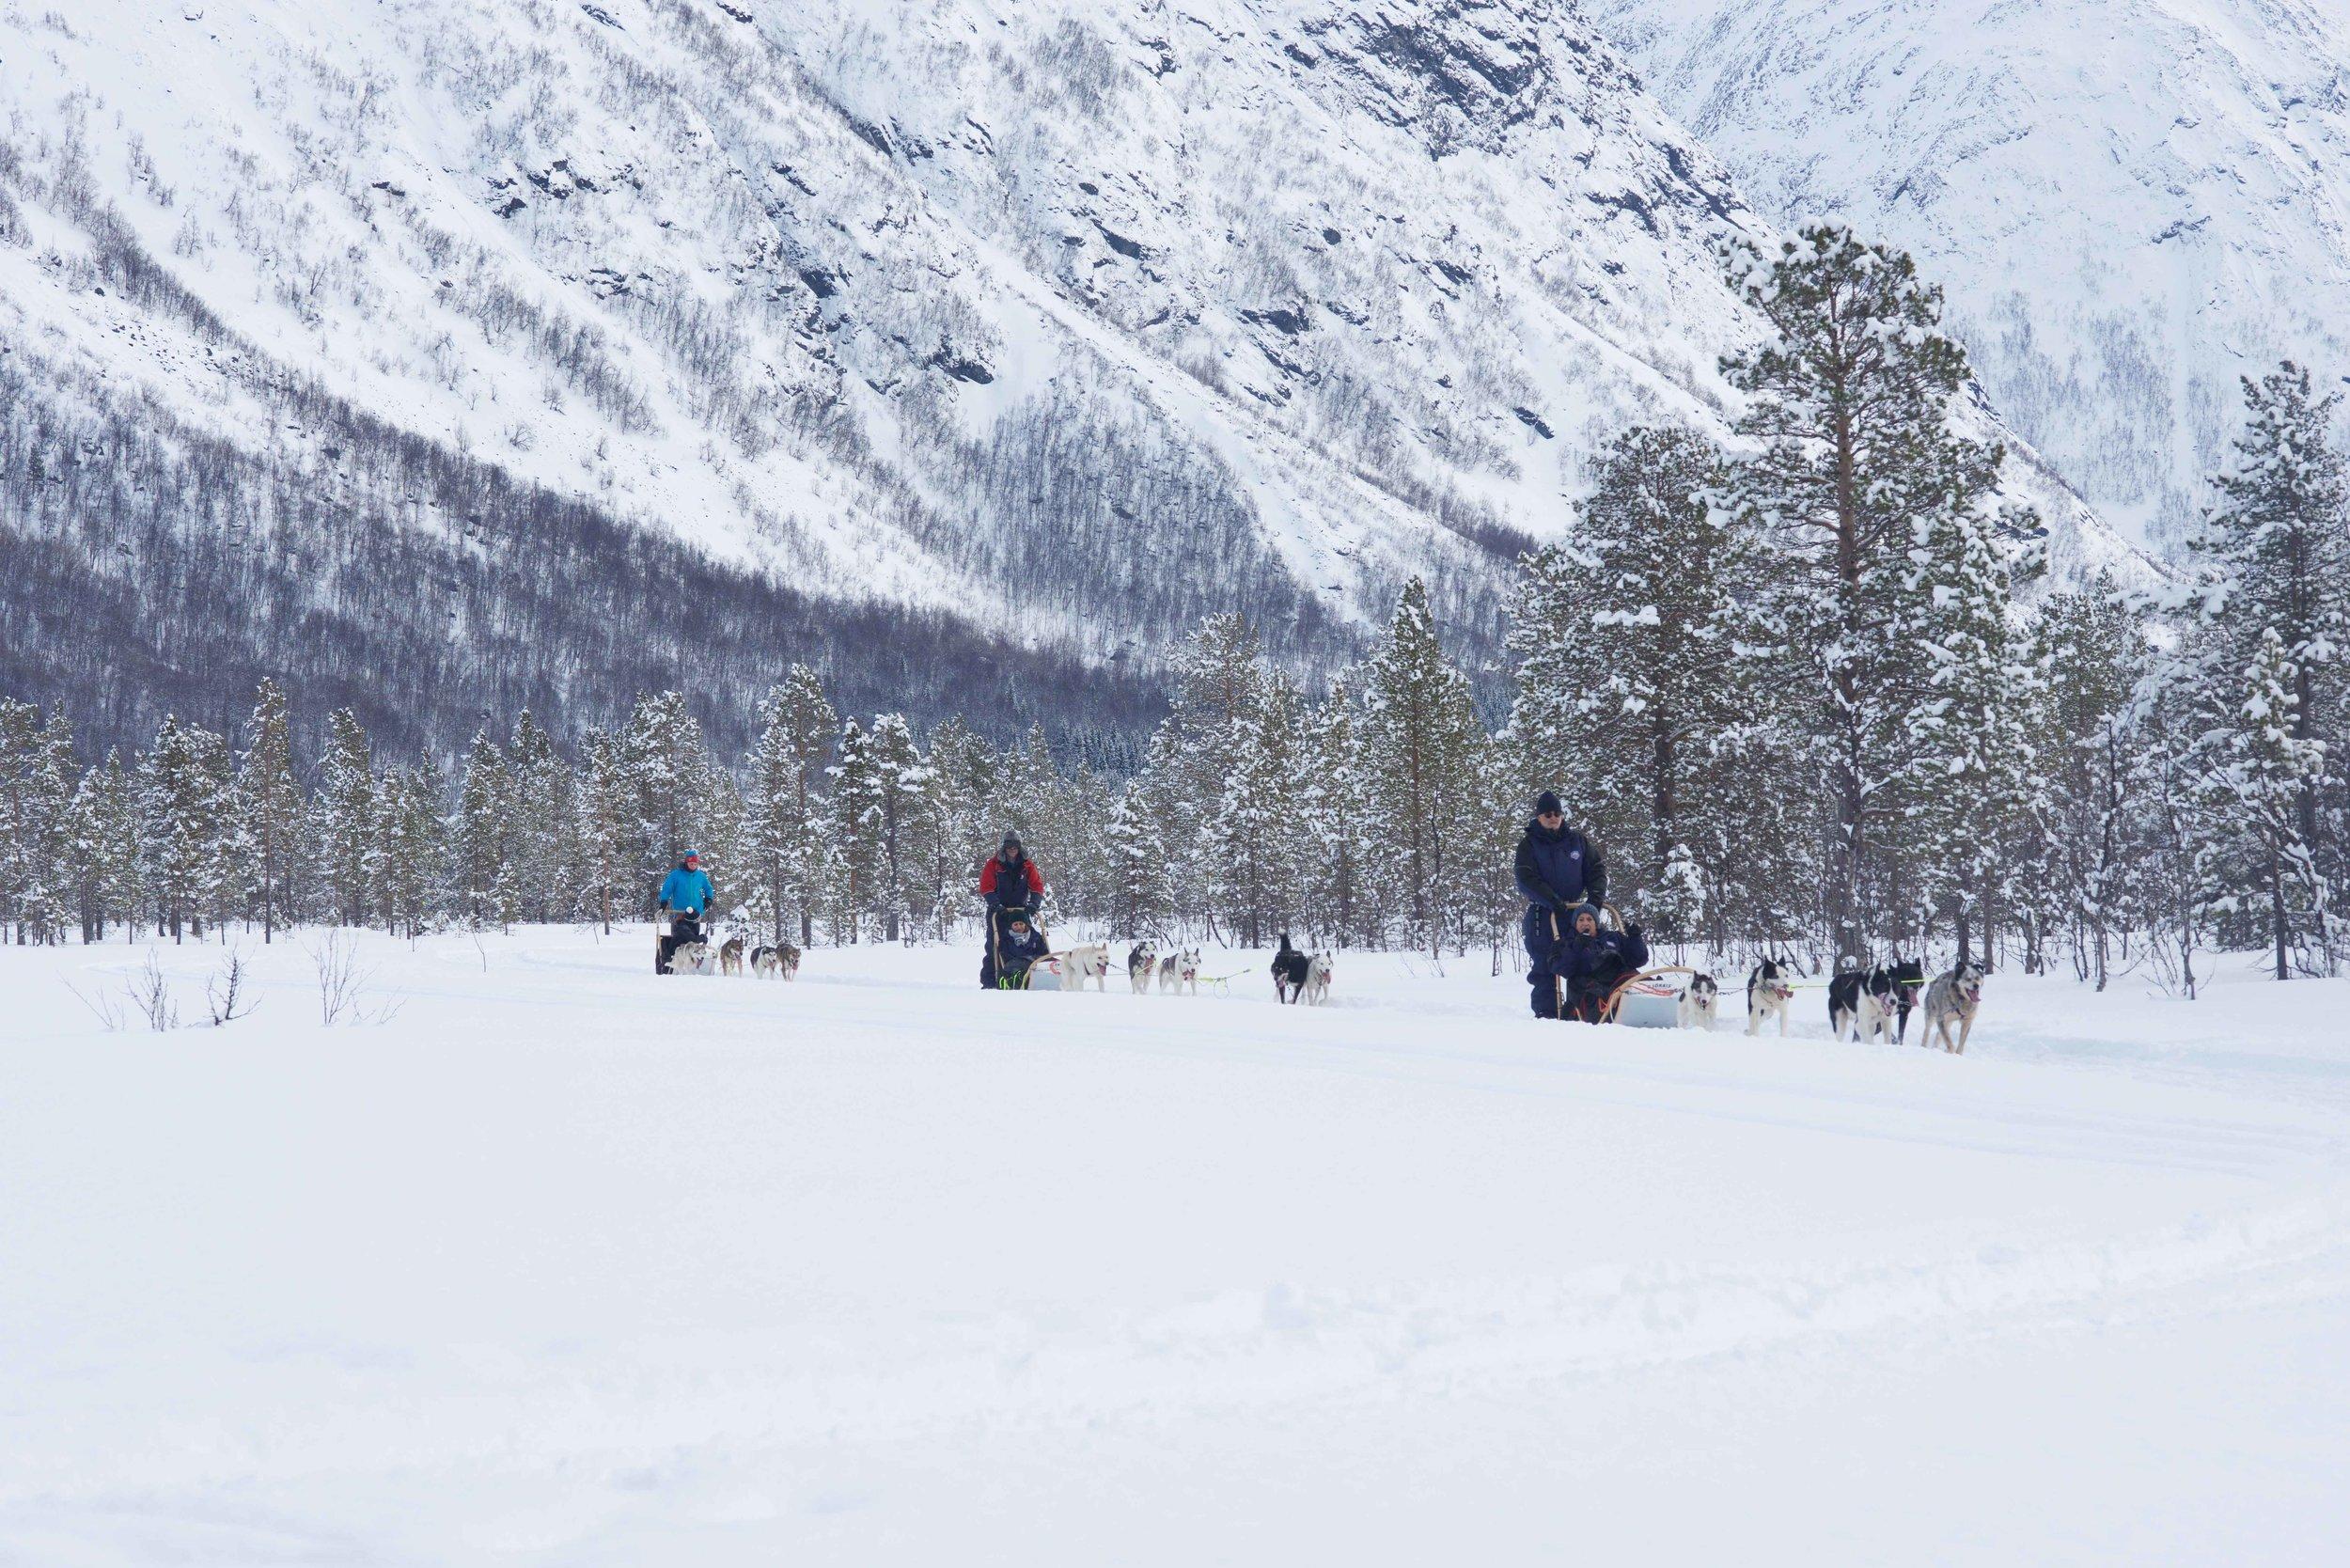 Dog sledging, organized by Lyngen Lodge, Arctic Circle, Norway. Image@thingstodot.com